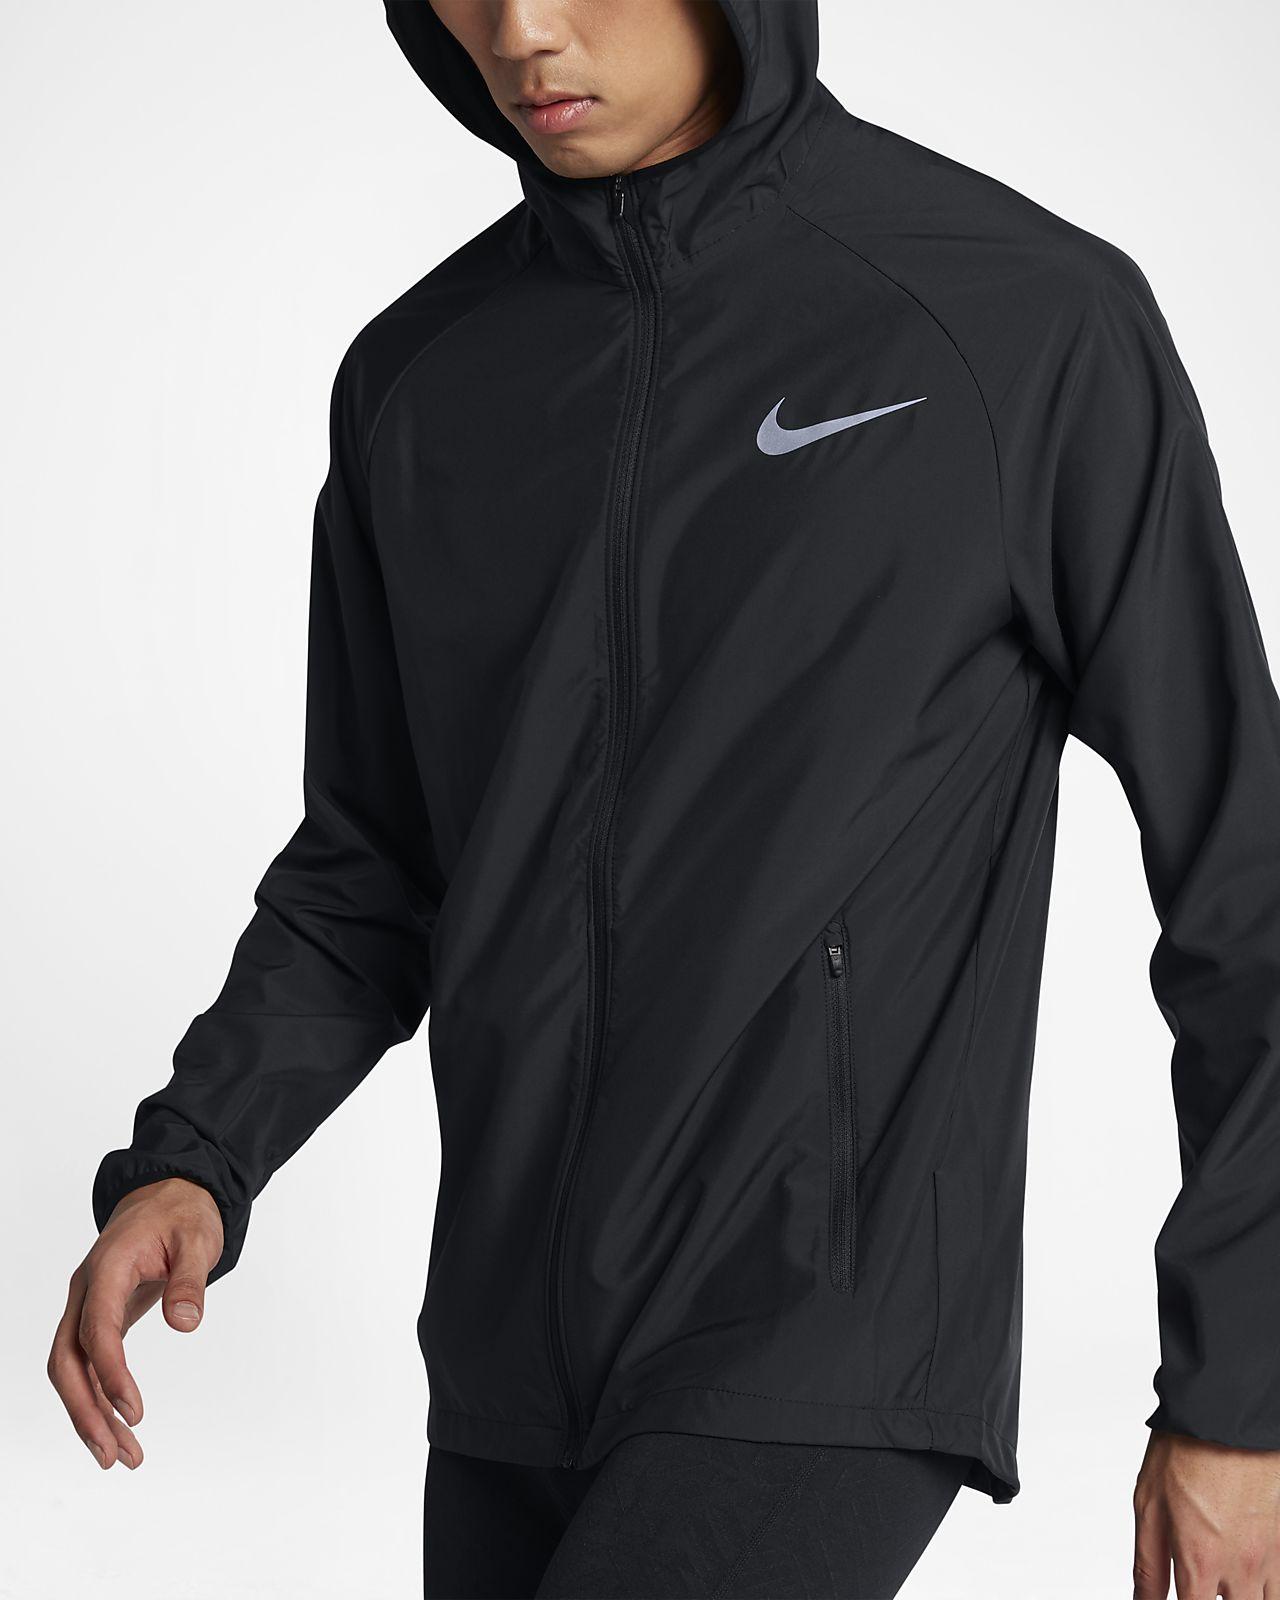 0ab444a7 Low Resolution Nike Essential løpejakke for herre Nike Essential løpejakke  for herre